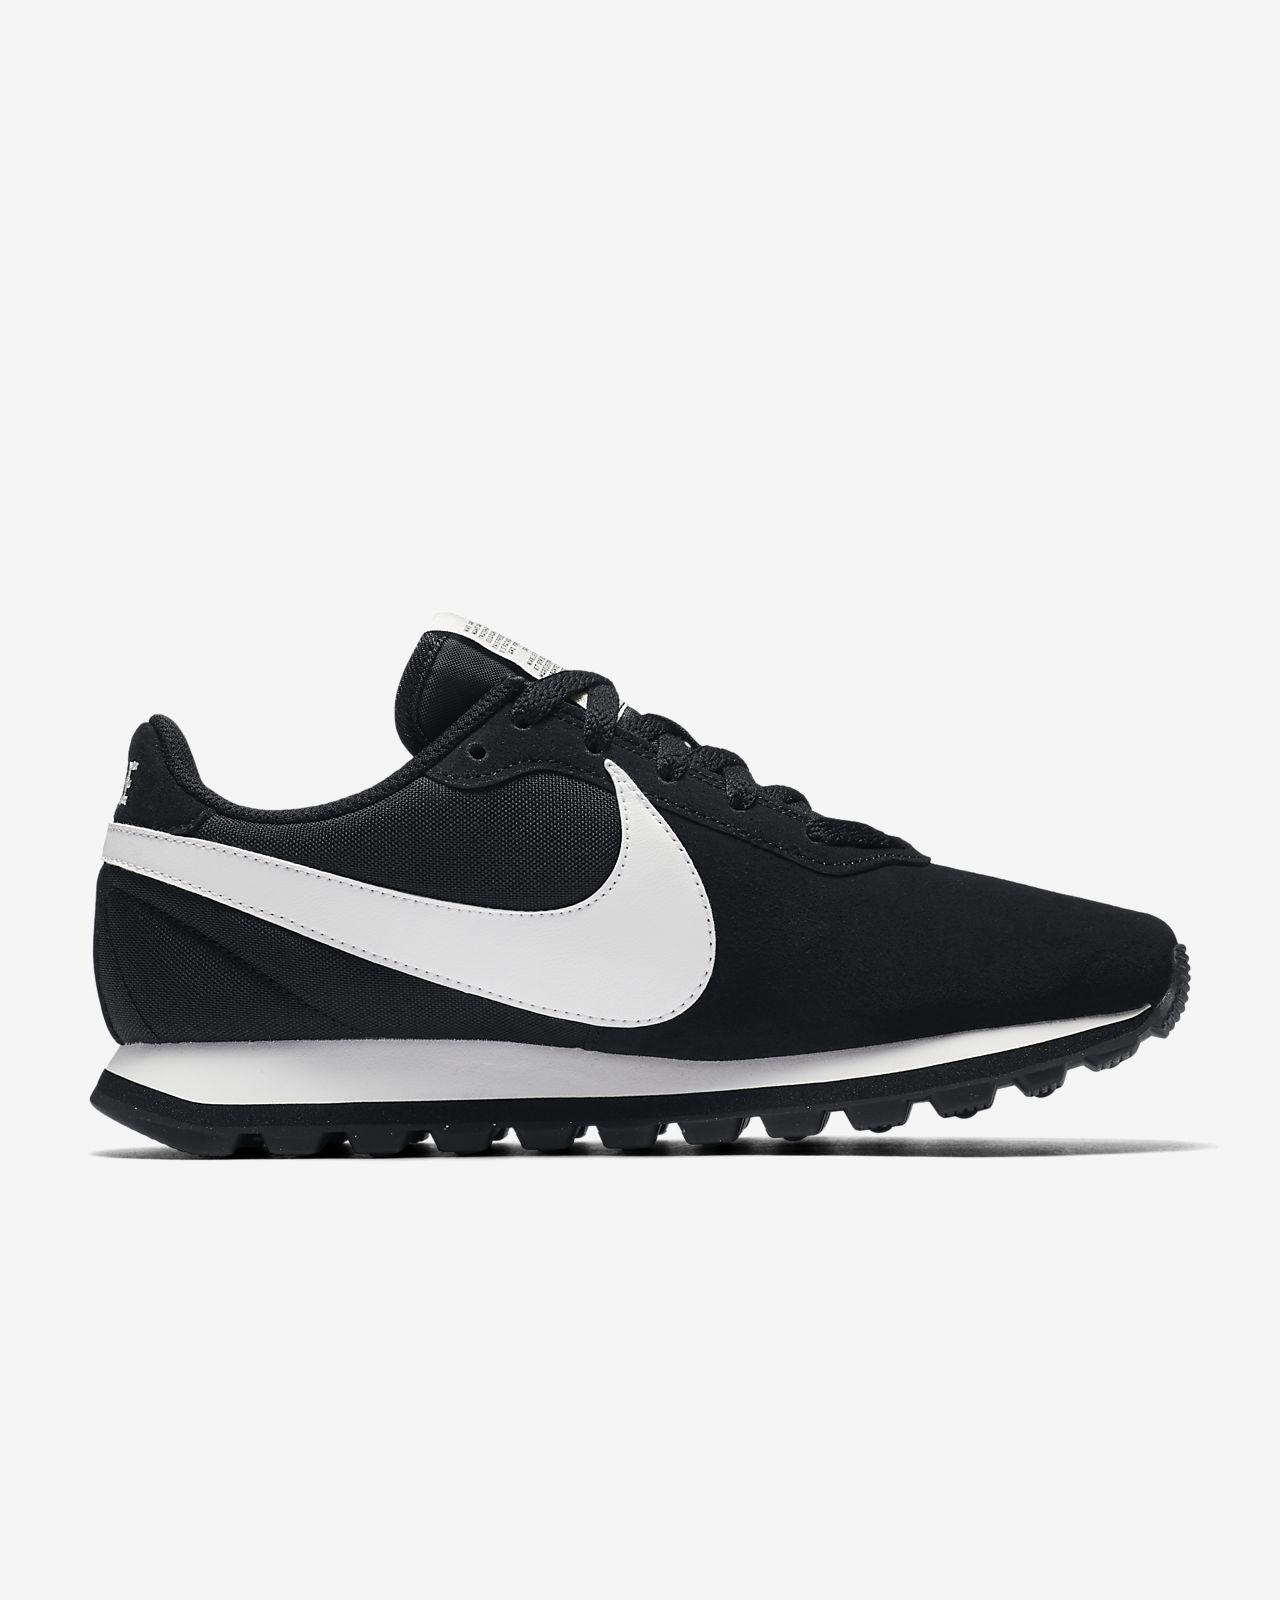 detailed look 8c710 2fa0b ... Chaussure Nike Pre-Love O.X. pour Femme